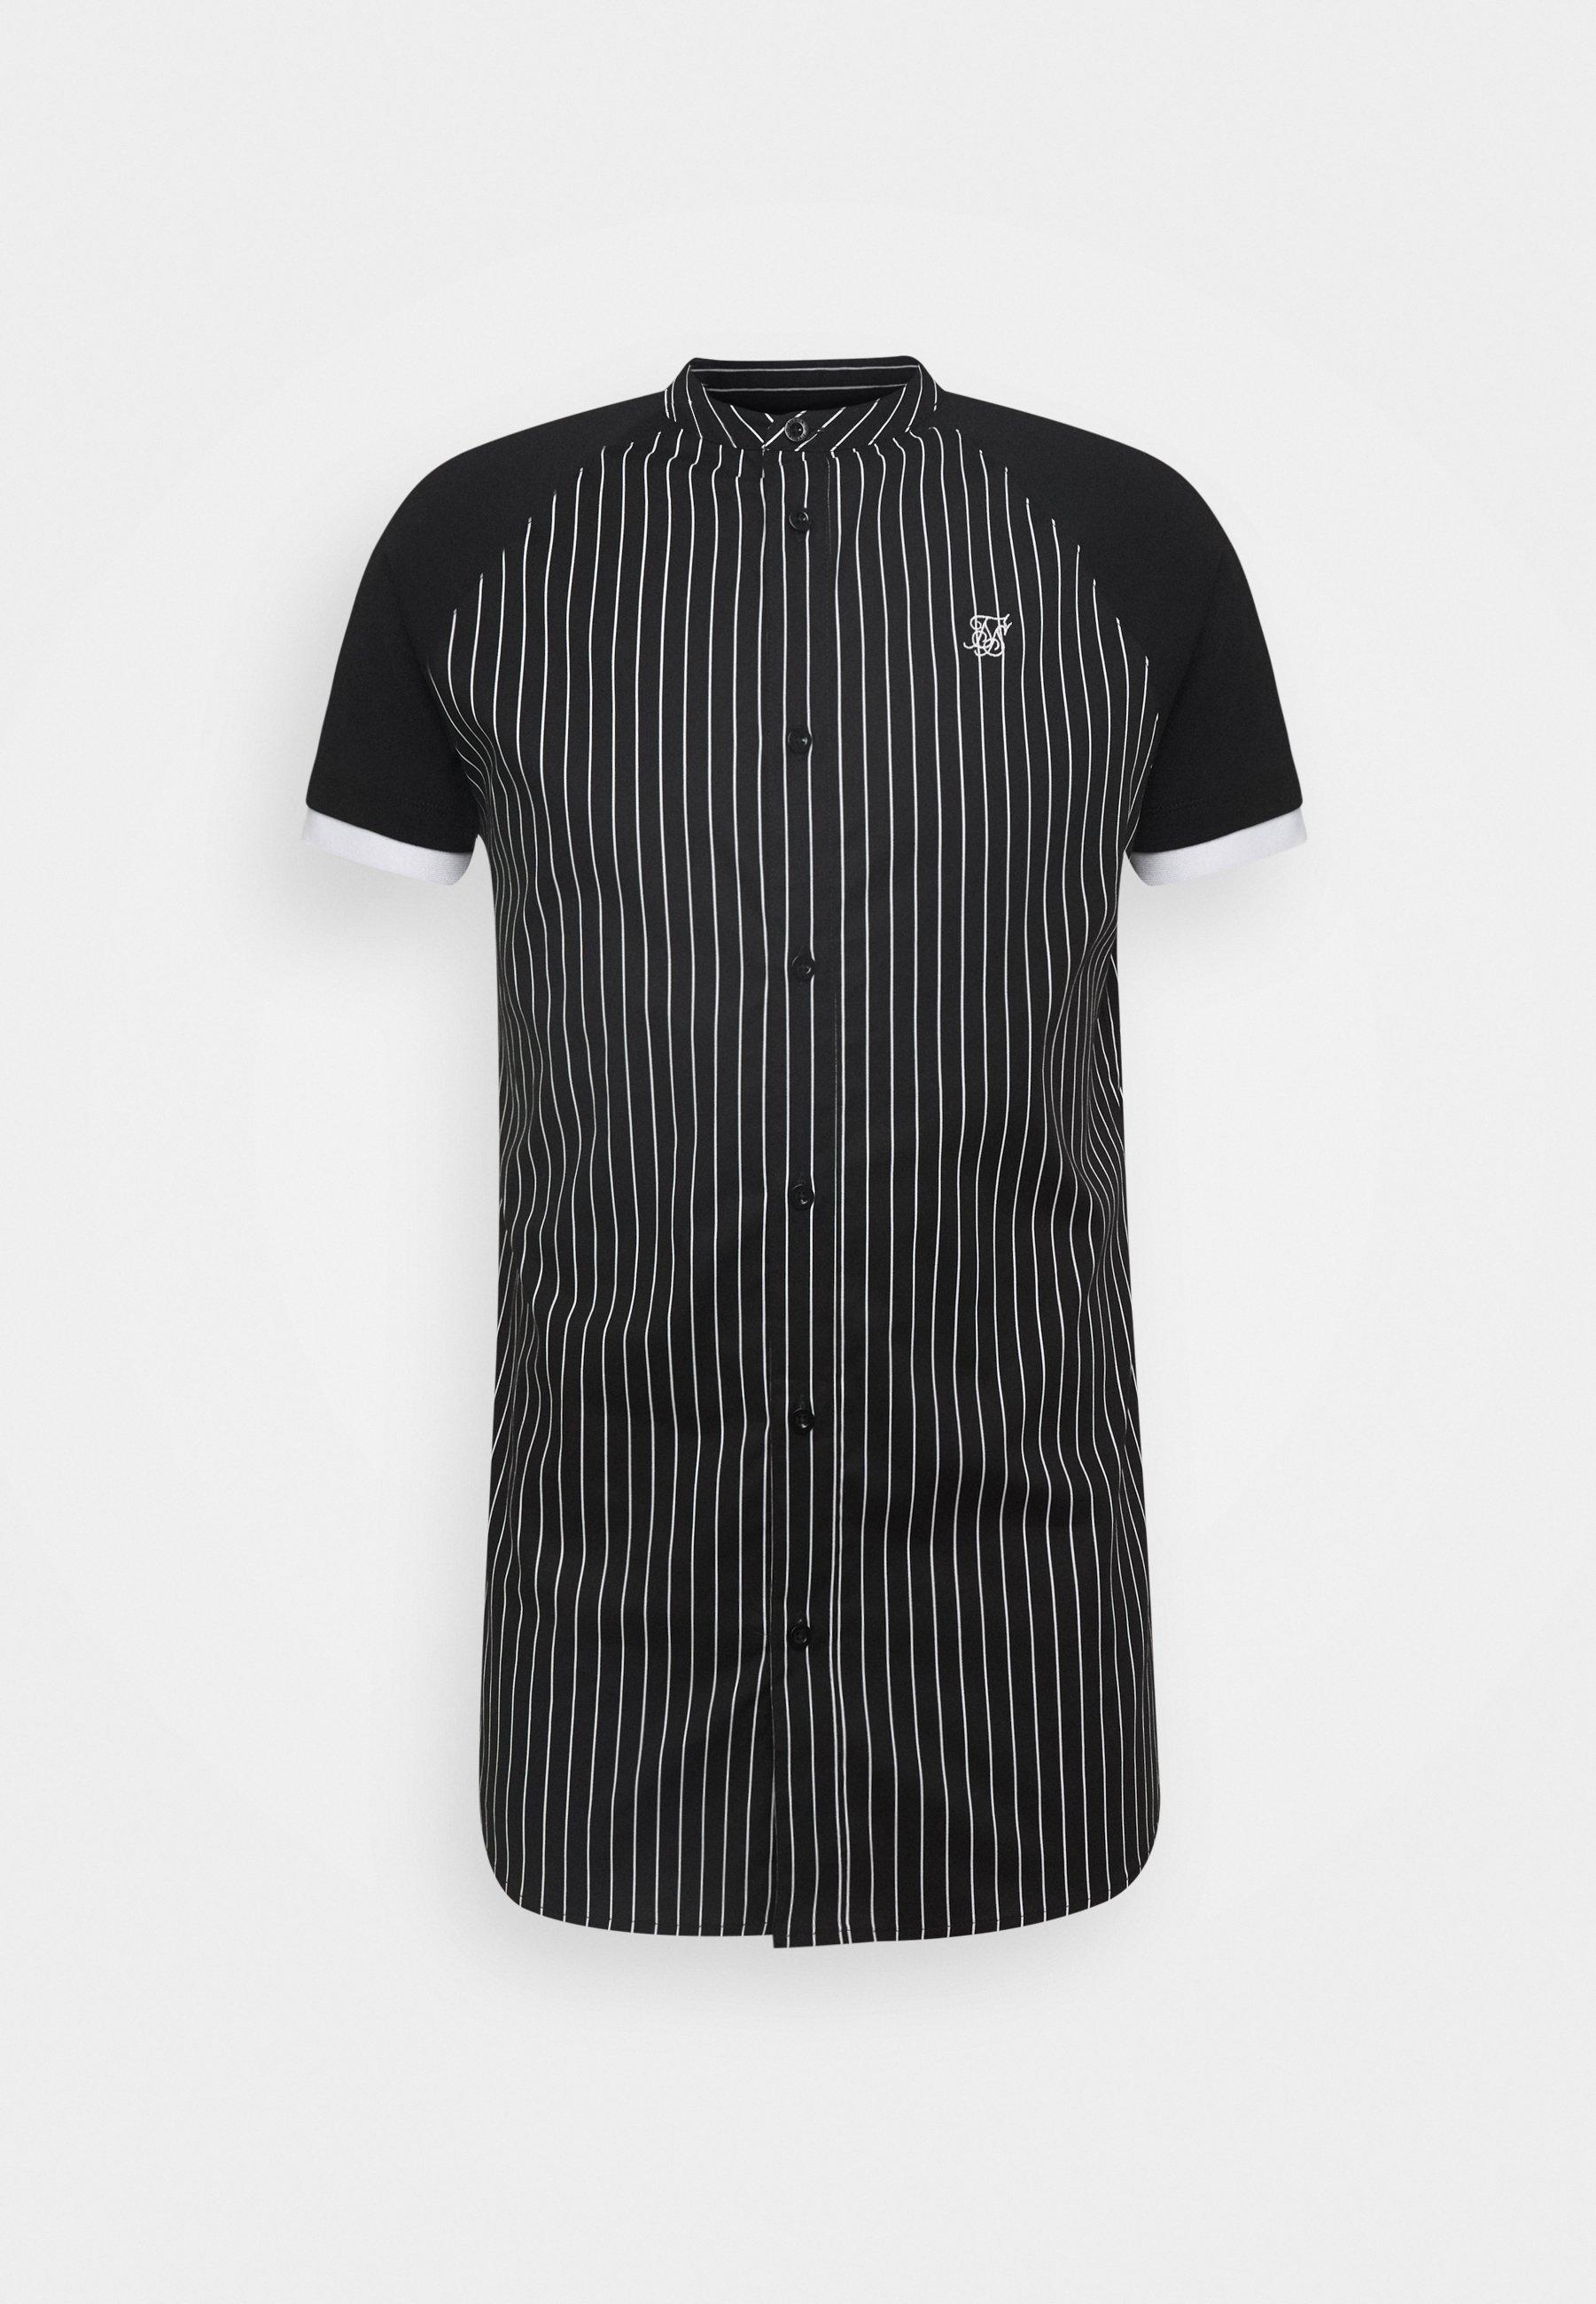 Siksilk Raglan Inset - Skjorte Black/white